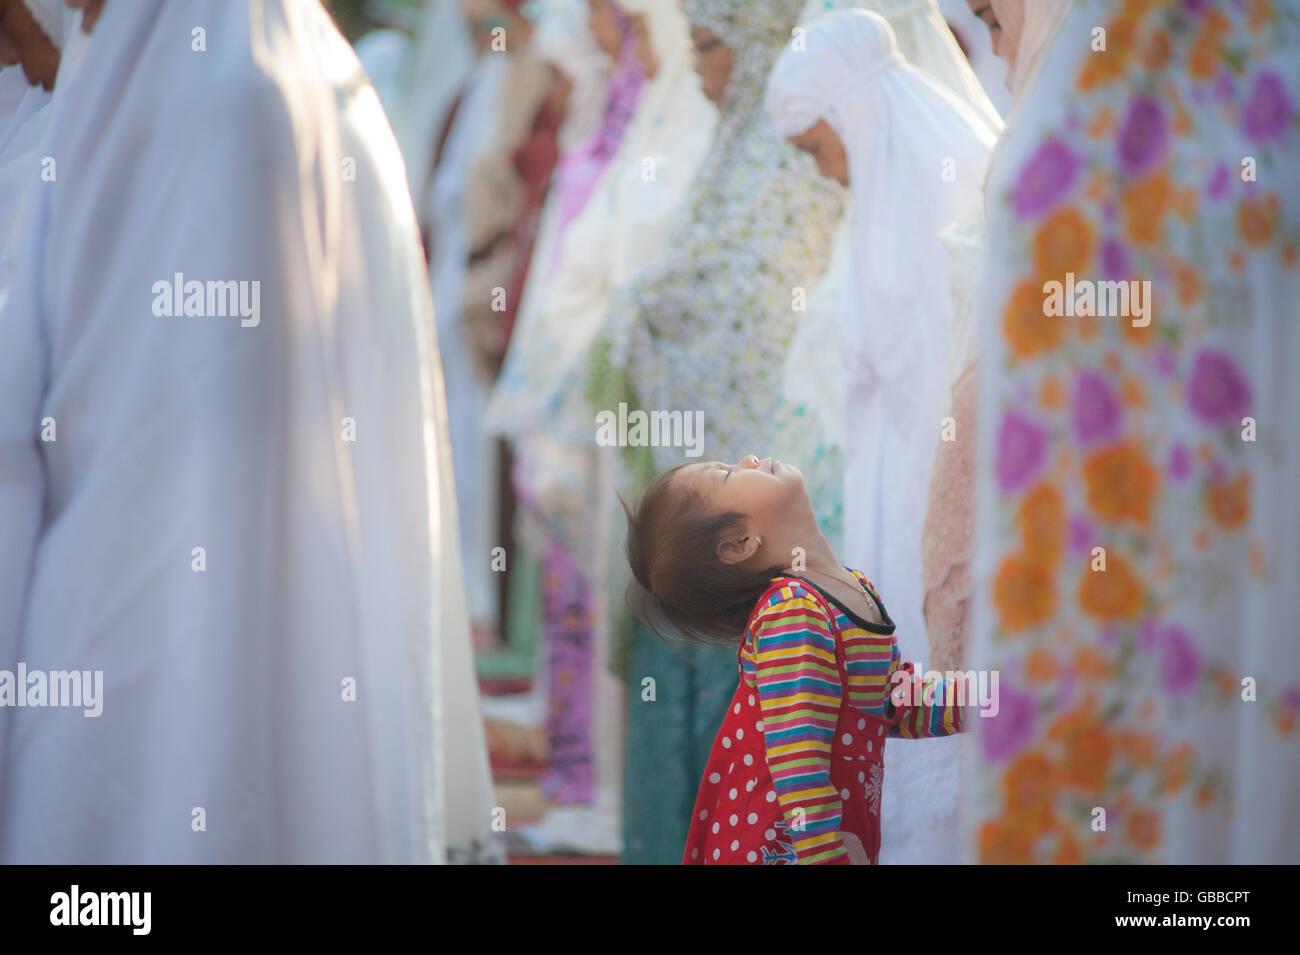 Best Indonesian Eid Al-Fitr Decorations - central-jakarta-indonesia-06th-july-2016-a-children-amid-eid-al-fitr-GBBCPT  HD_722496 .jpg